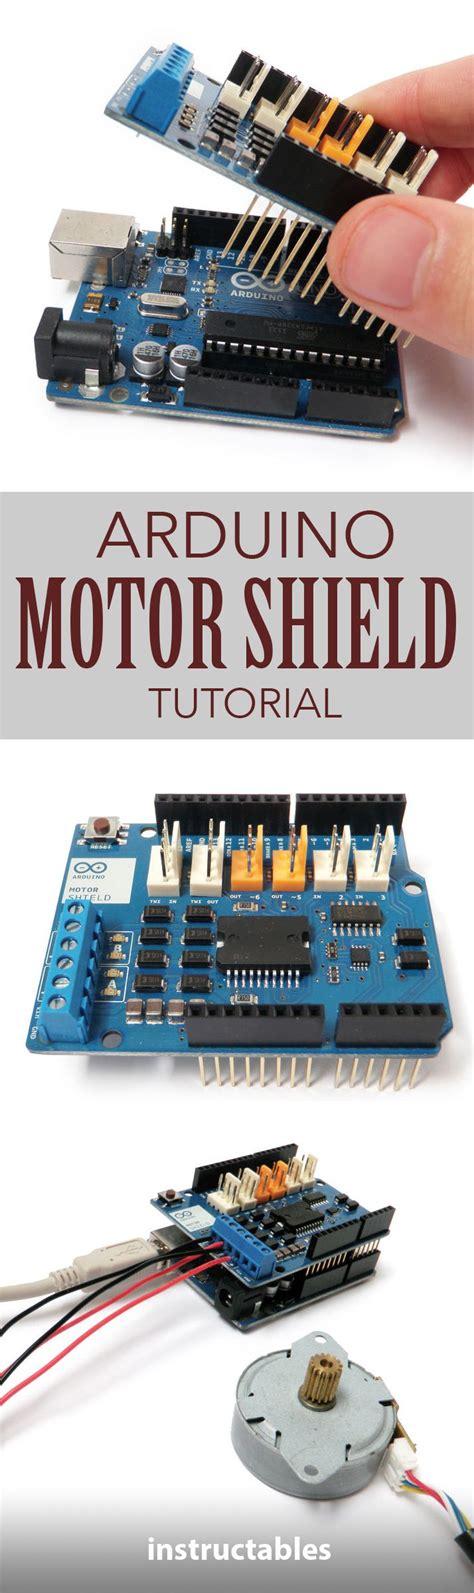 tutorial arduino motor shield 25 best ideas about motor shield arduino on pinterest